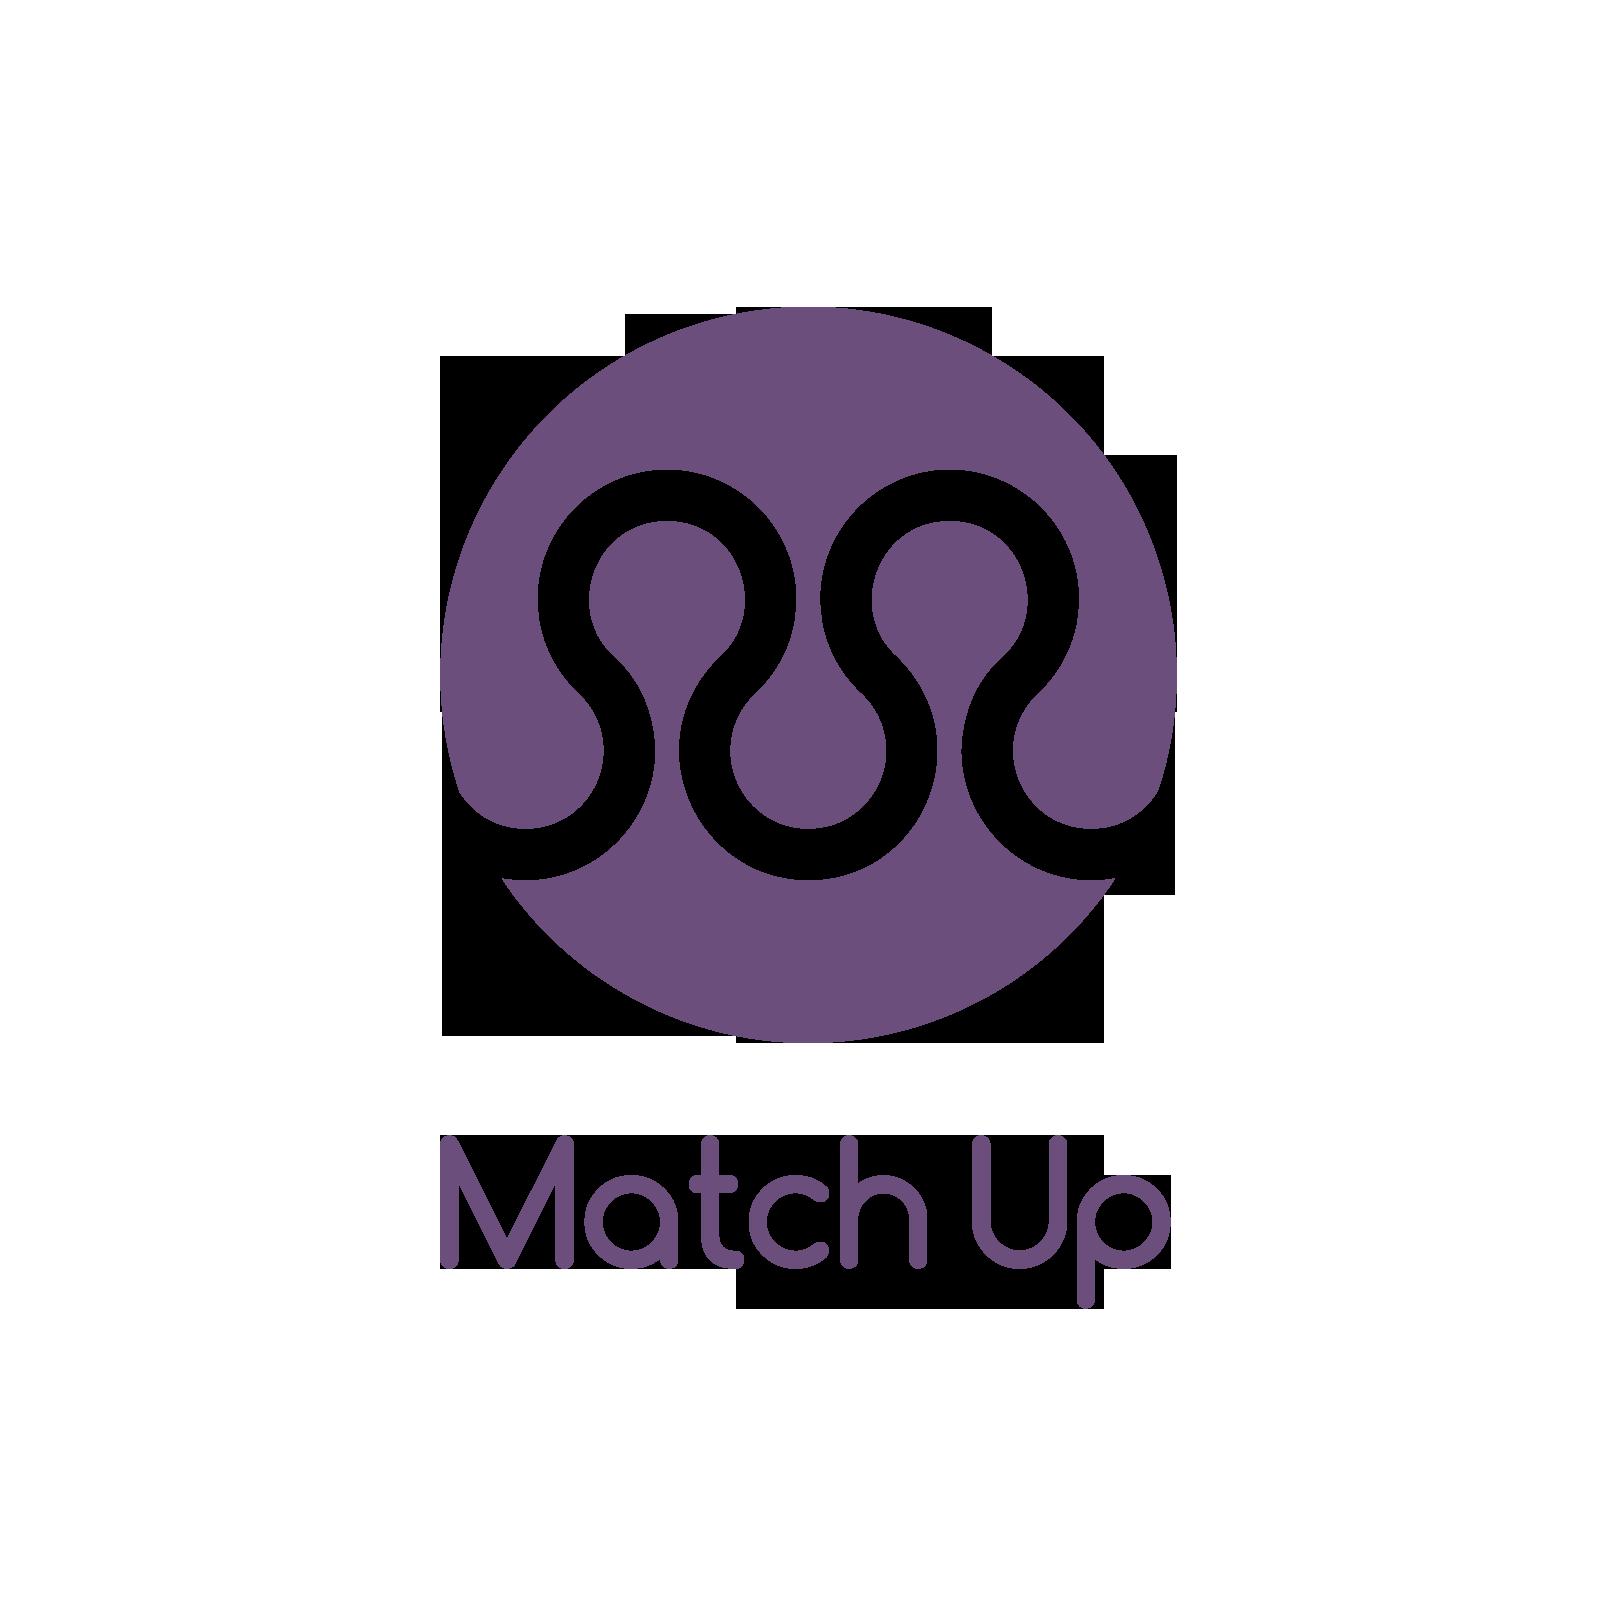 Match Up